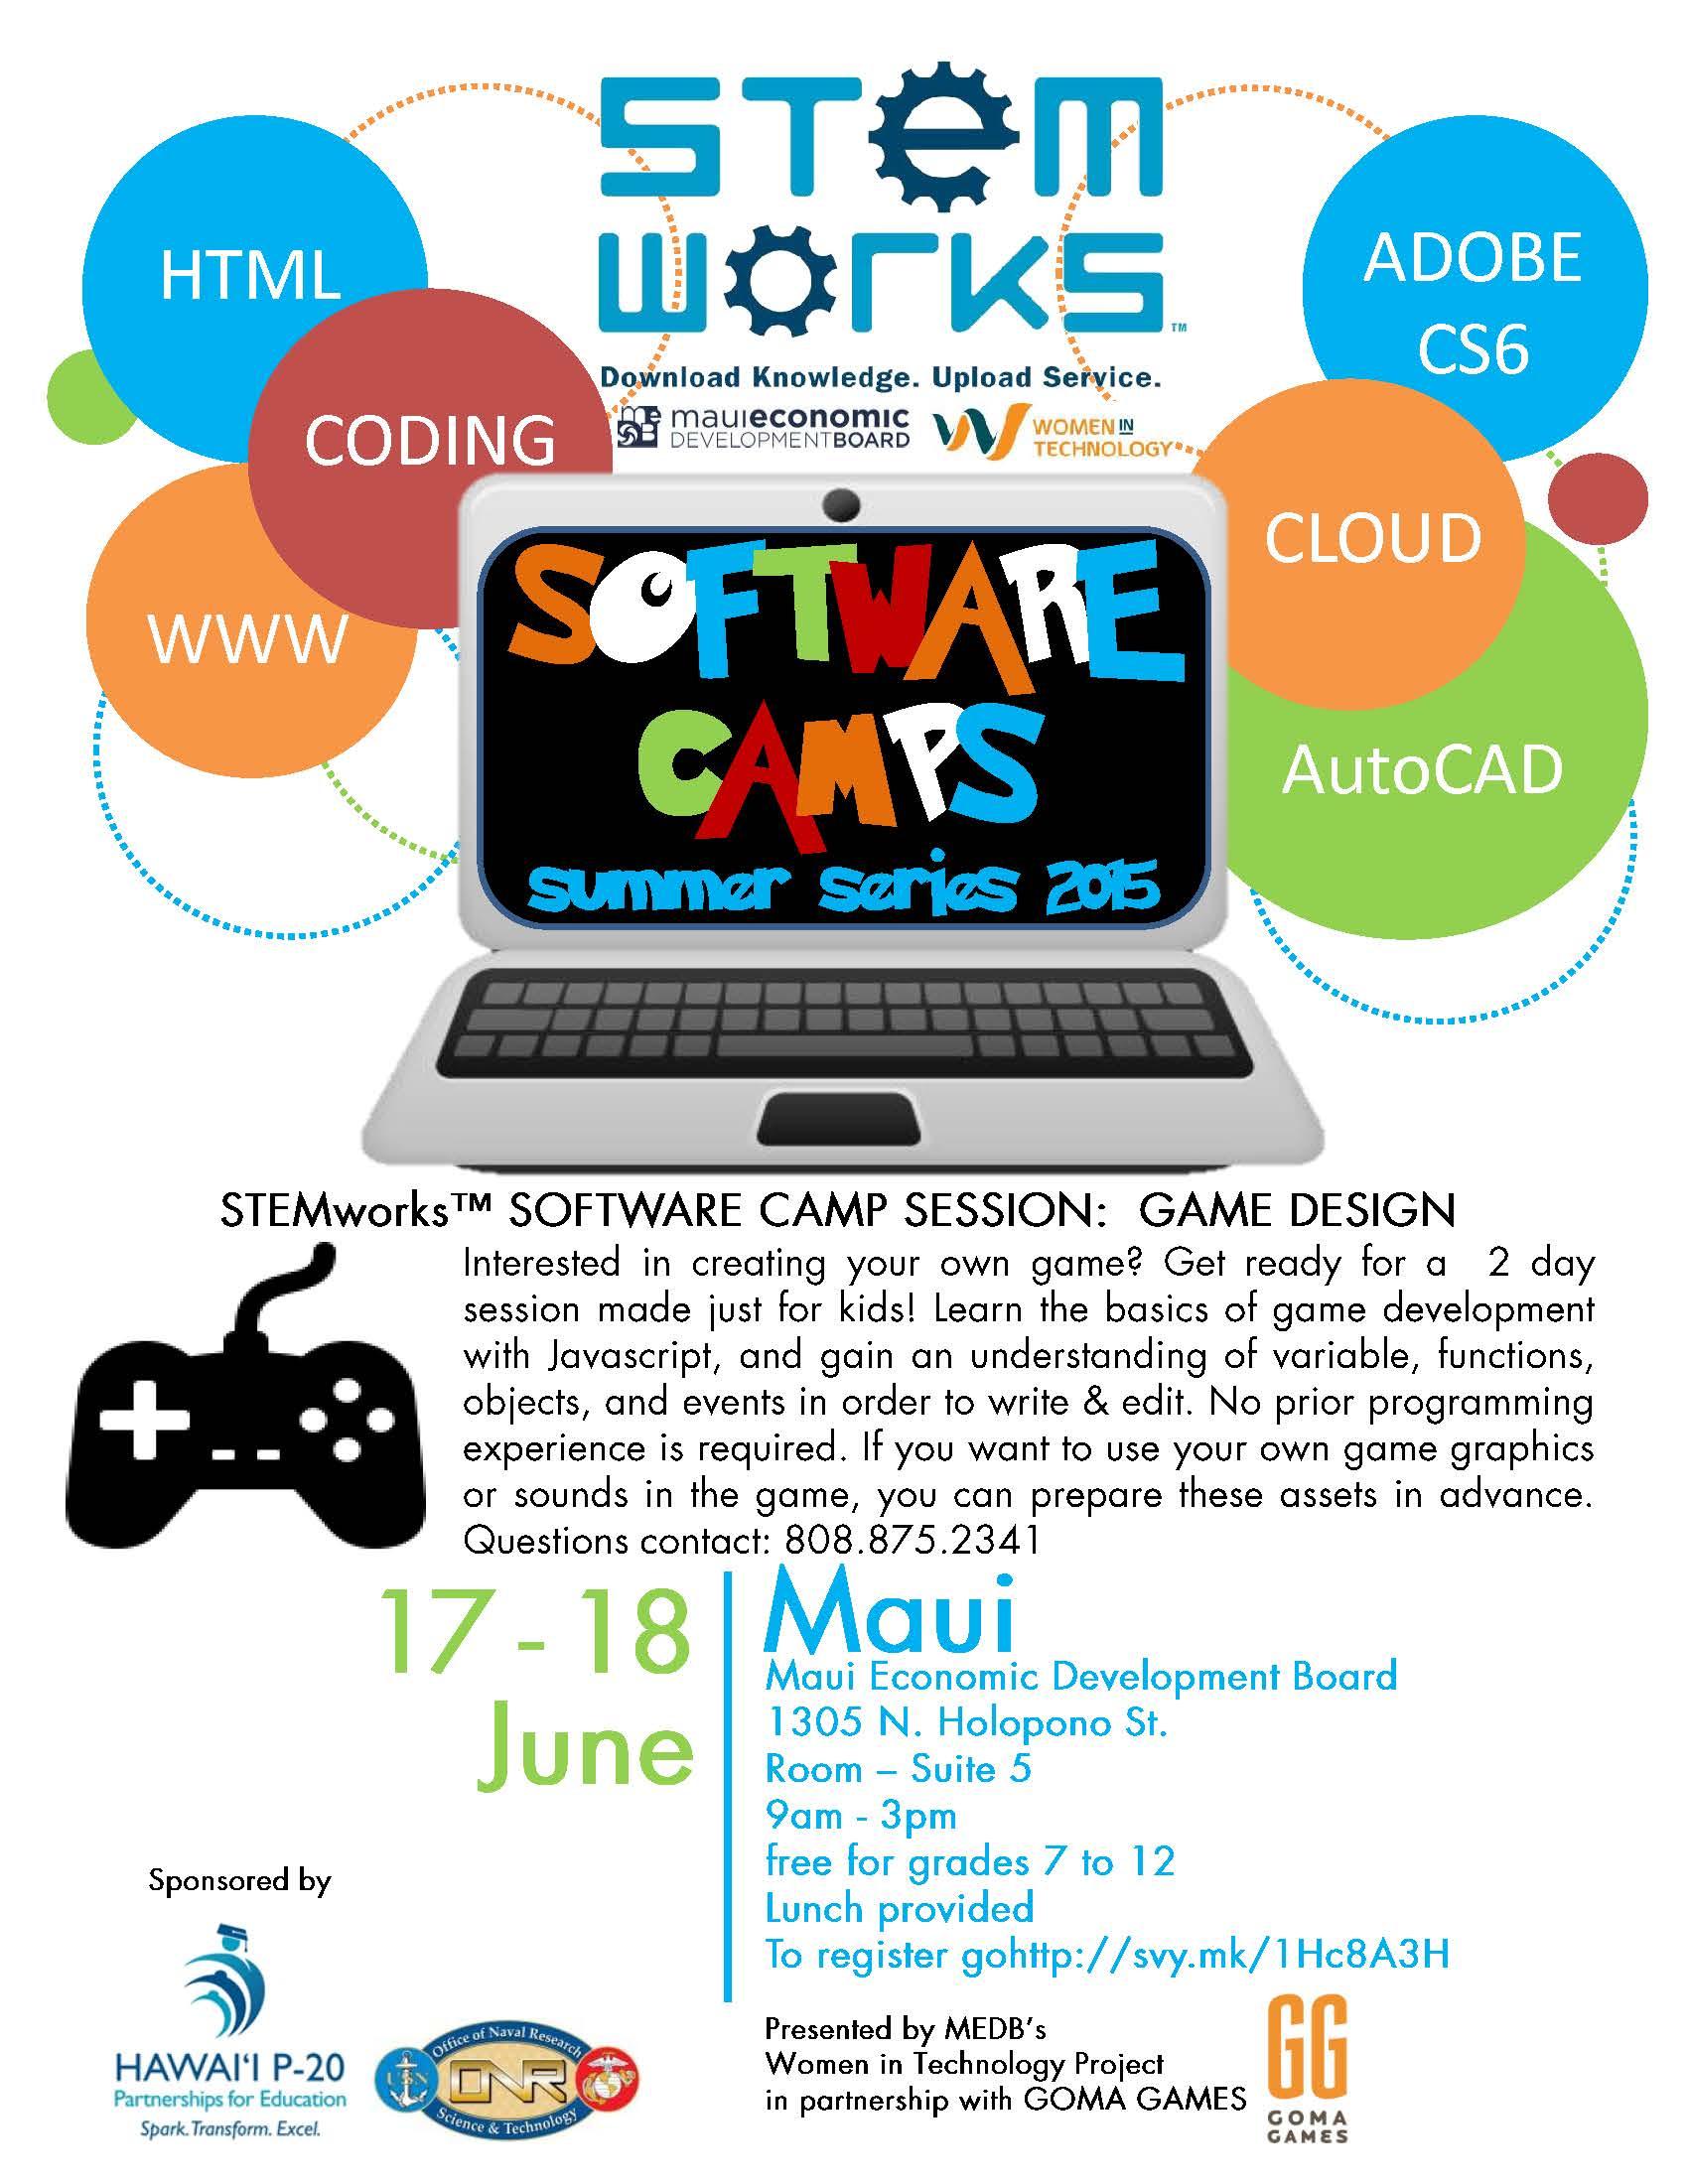 FLYER_MAUISoftwareCamp_summergamedesign2015.jpg